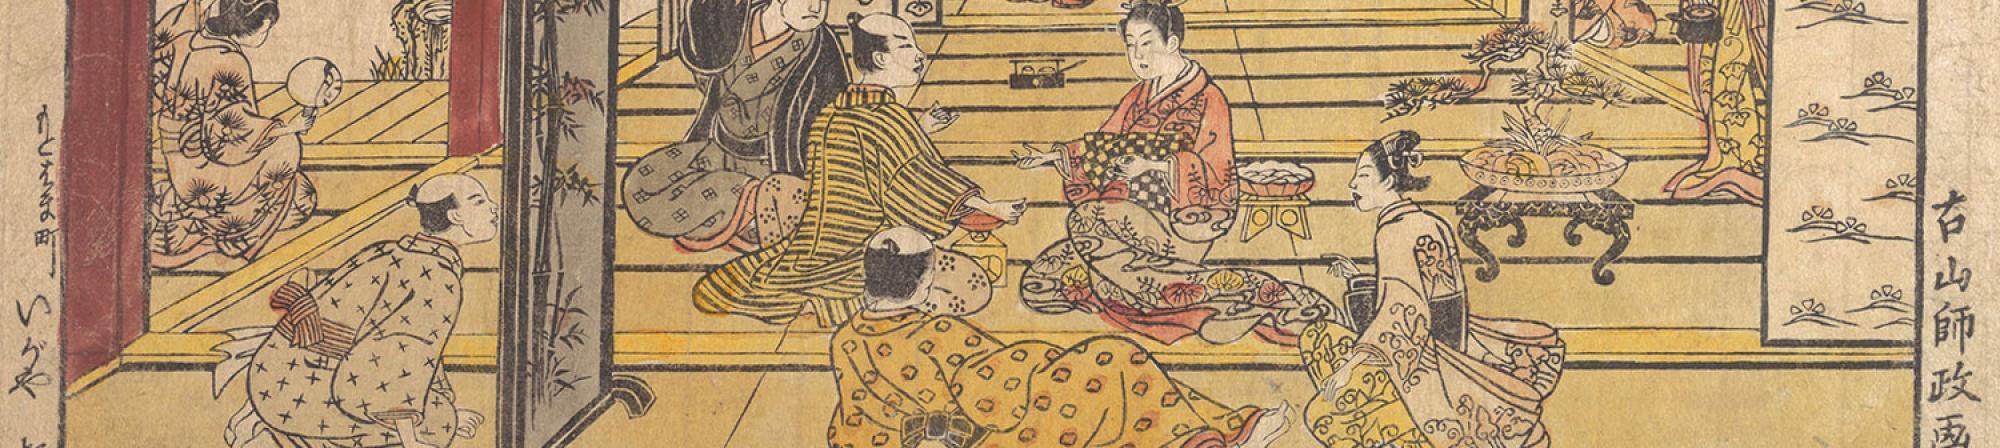 "Detail of ""A Game of Hand Sumo in the New Yoshiwara"" by Furuyama Moromasa"